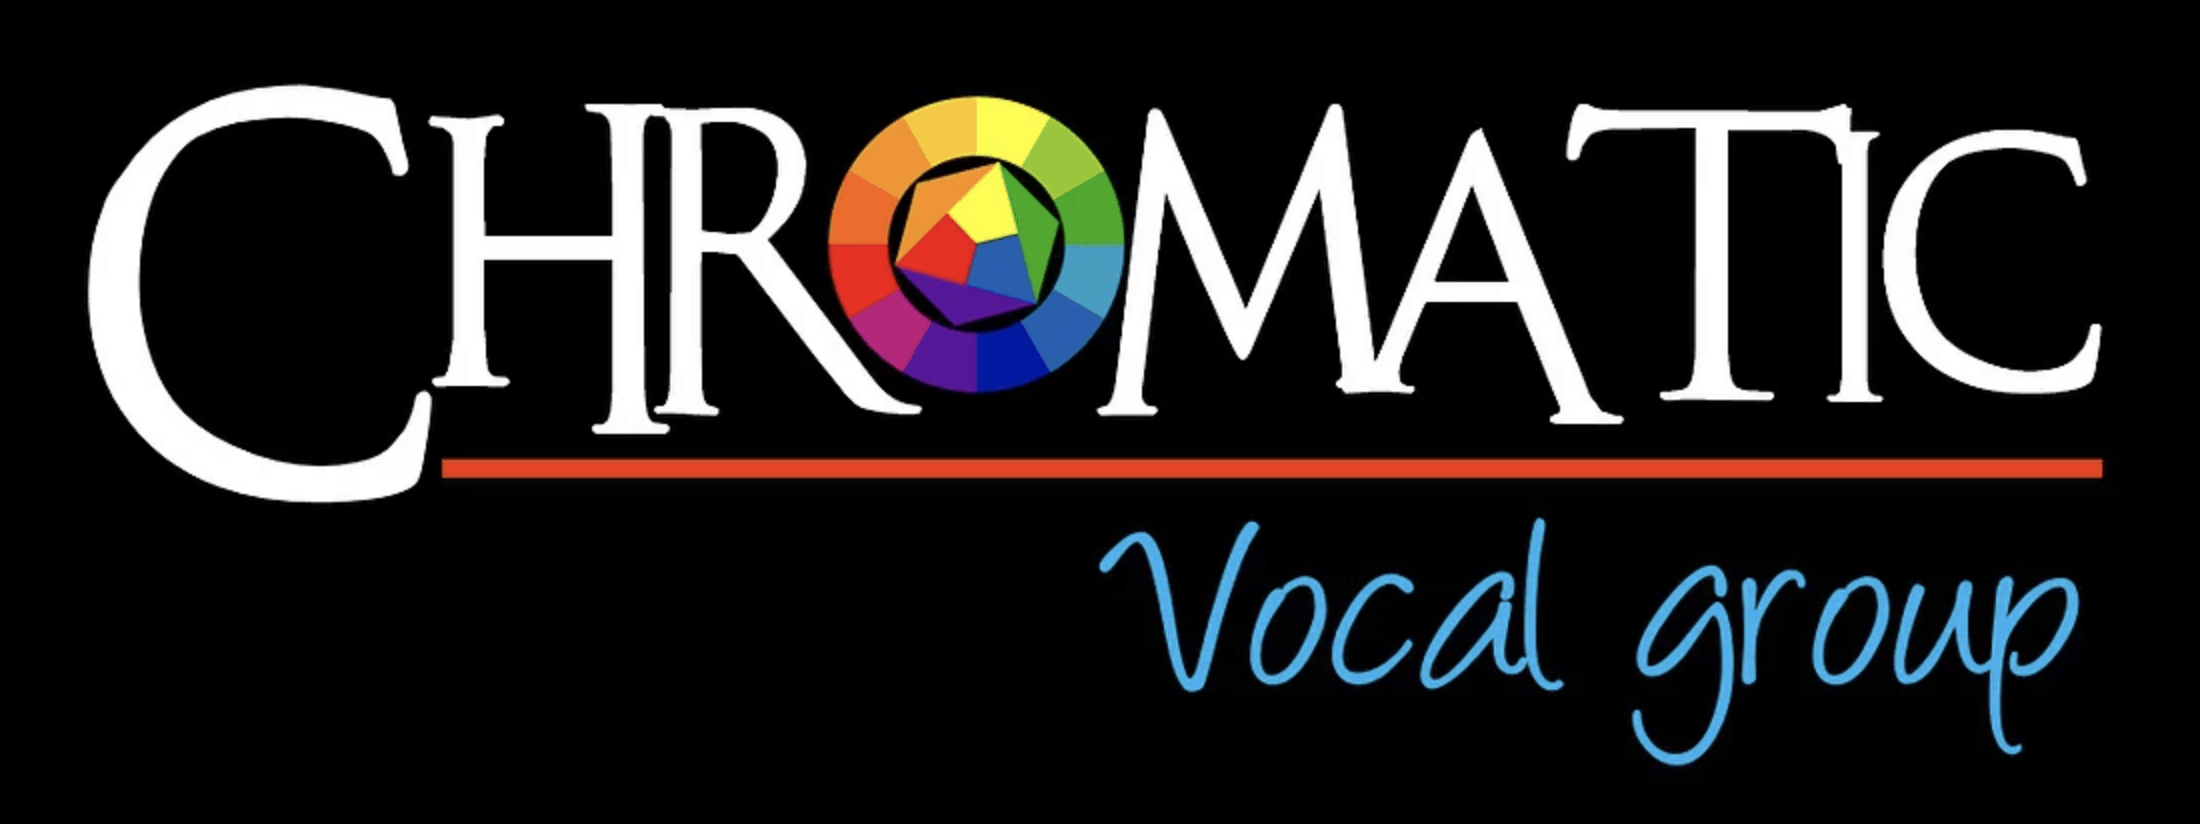 chromatic-vocal-group-logo